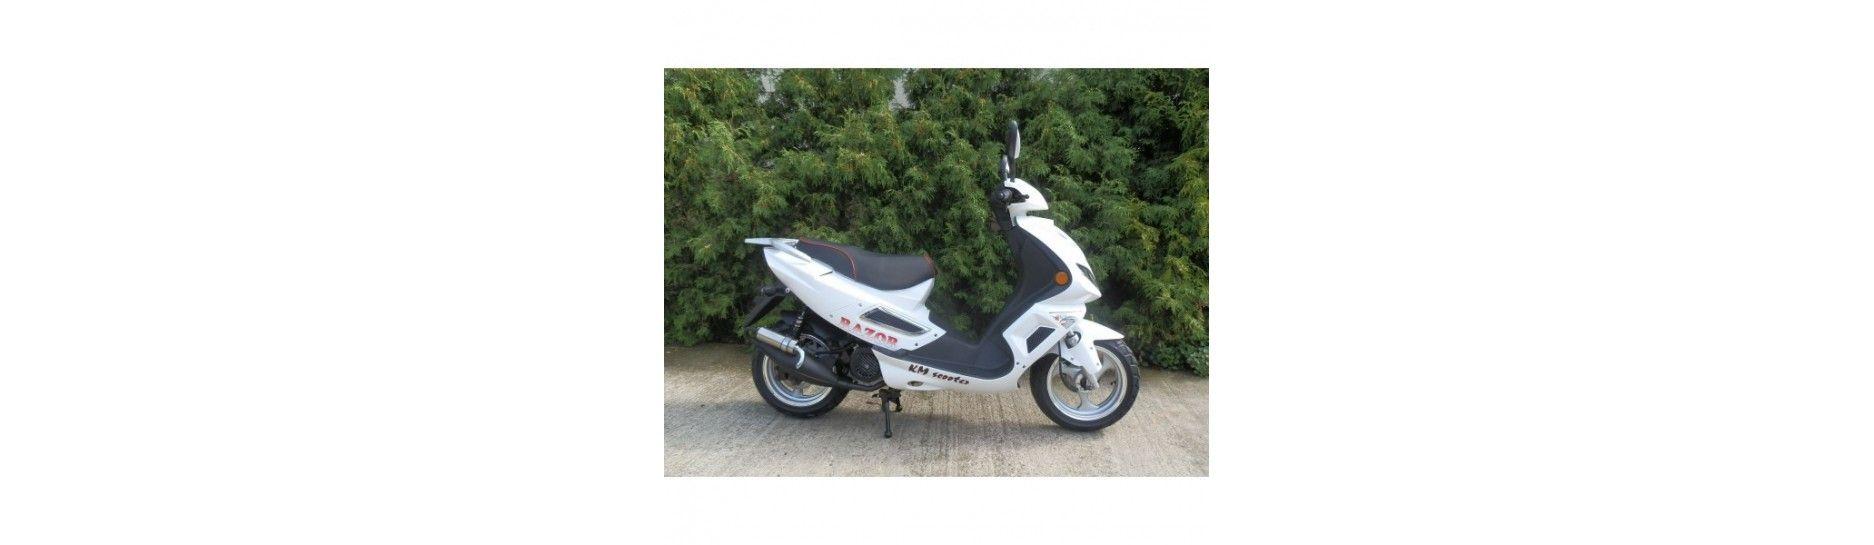 Razor 125cc